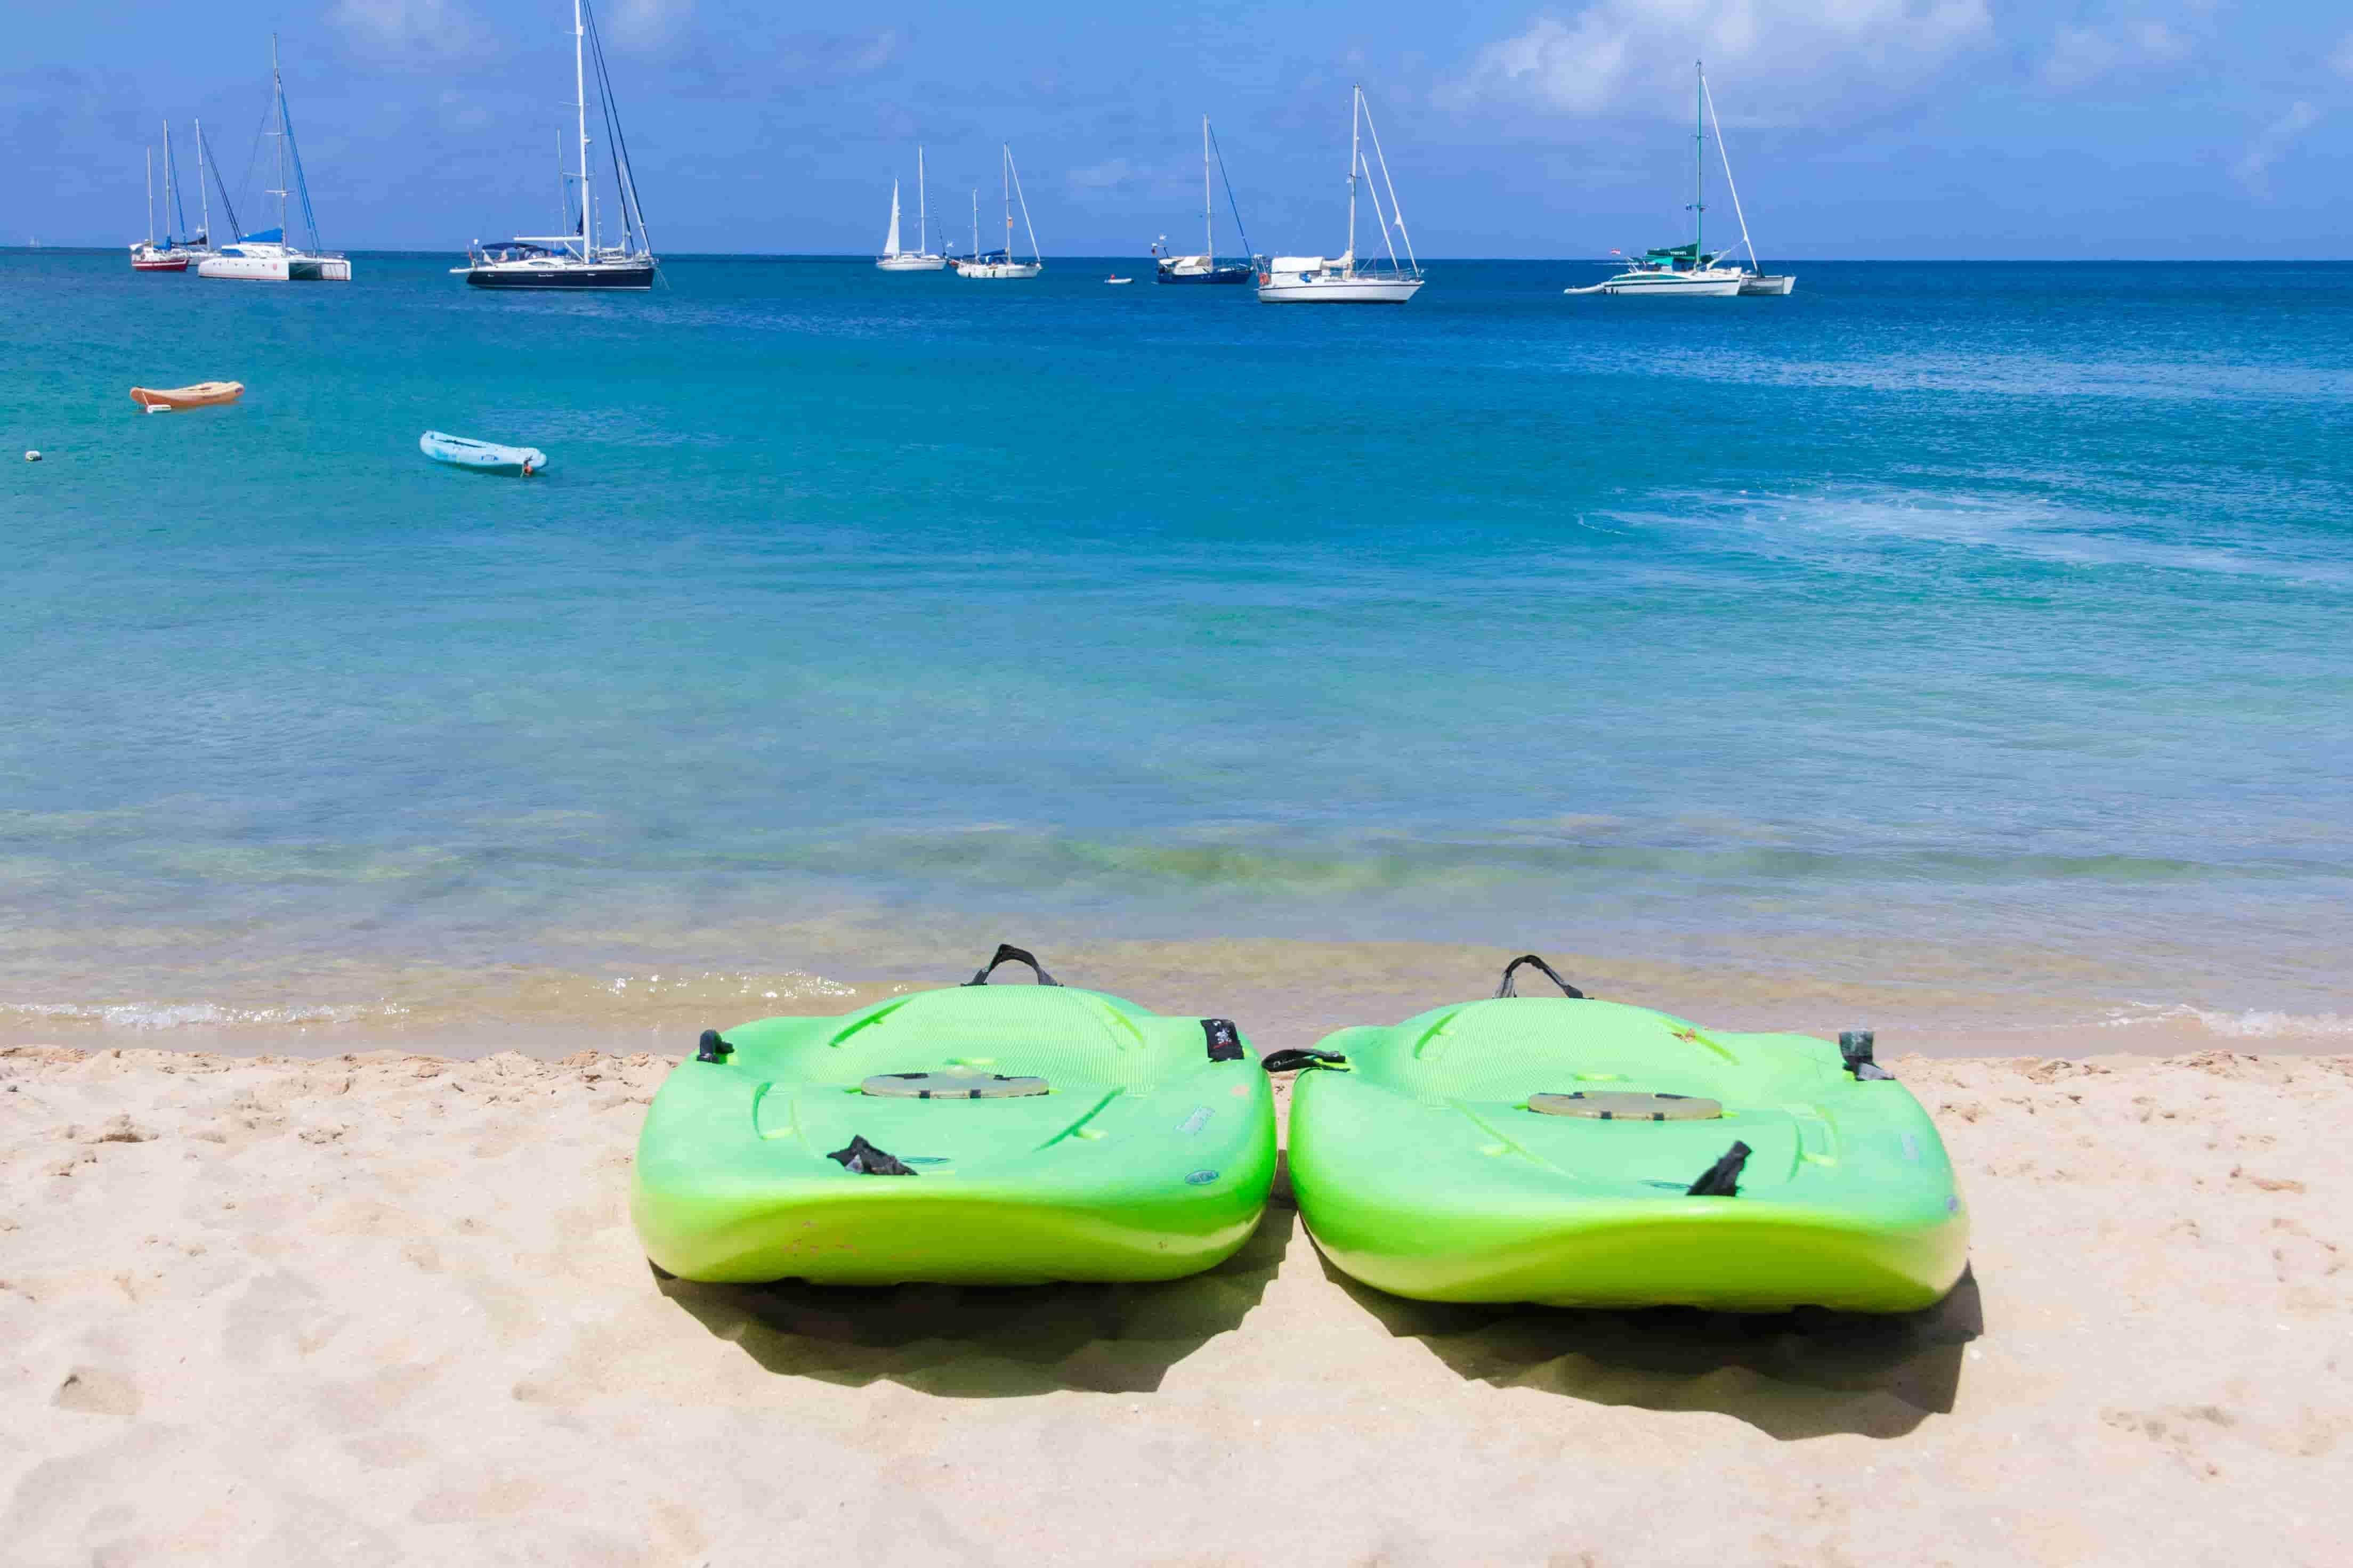 cf536f1edbe16b0b4cf16a79dc23627d - Bay Gardens Beach Resort Day Pass Reviews